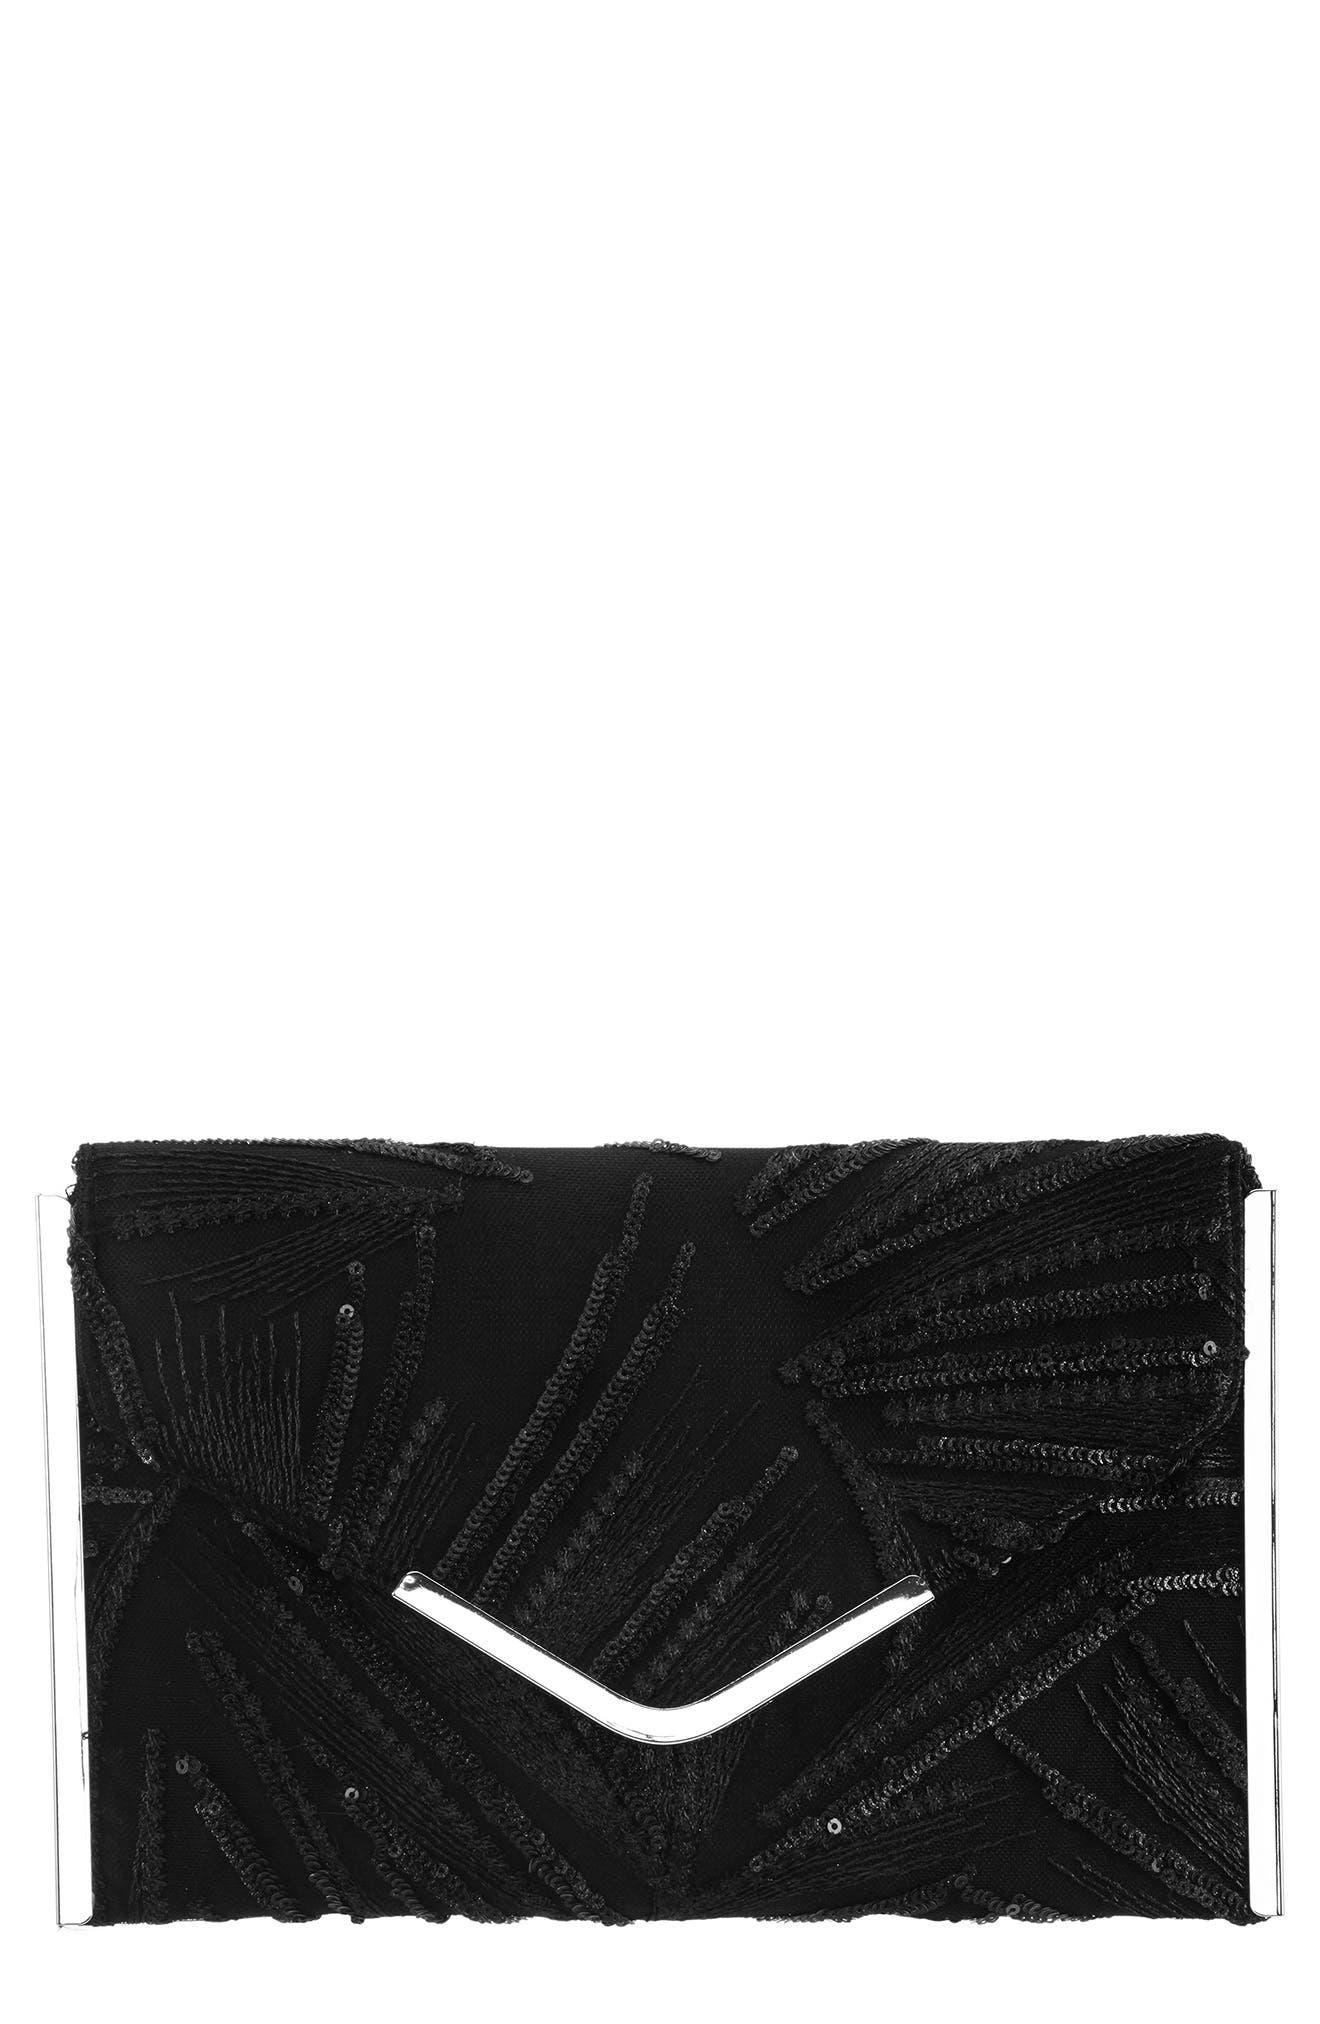 Embroidery Envelope Clutch Bag,                             Main thumbnail 1, color,                             BLACK